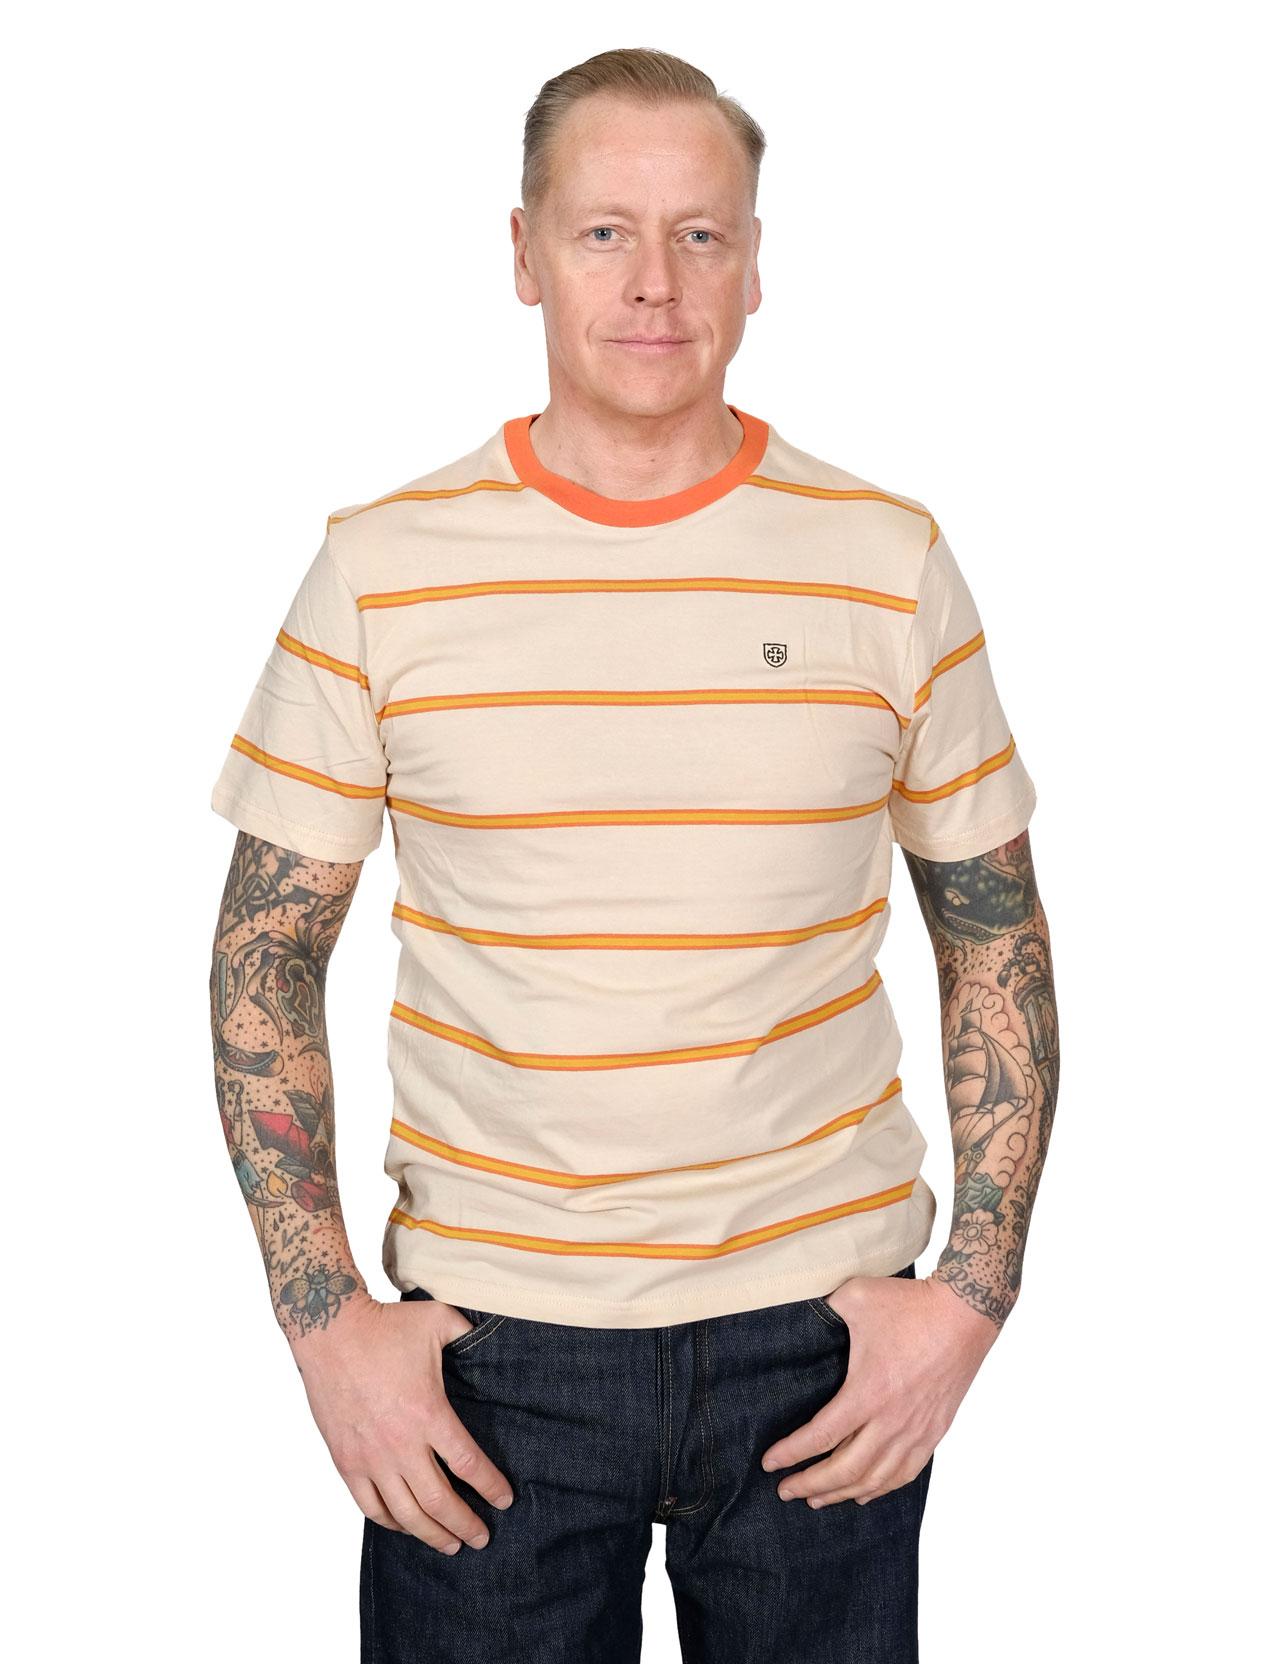 Brixton x Independent Deputy Knit S//S T-Shirt Tan Orange